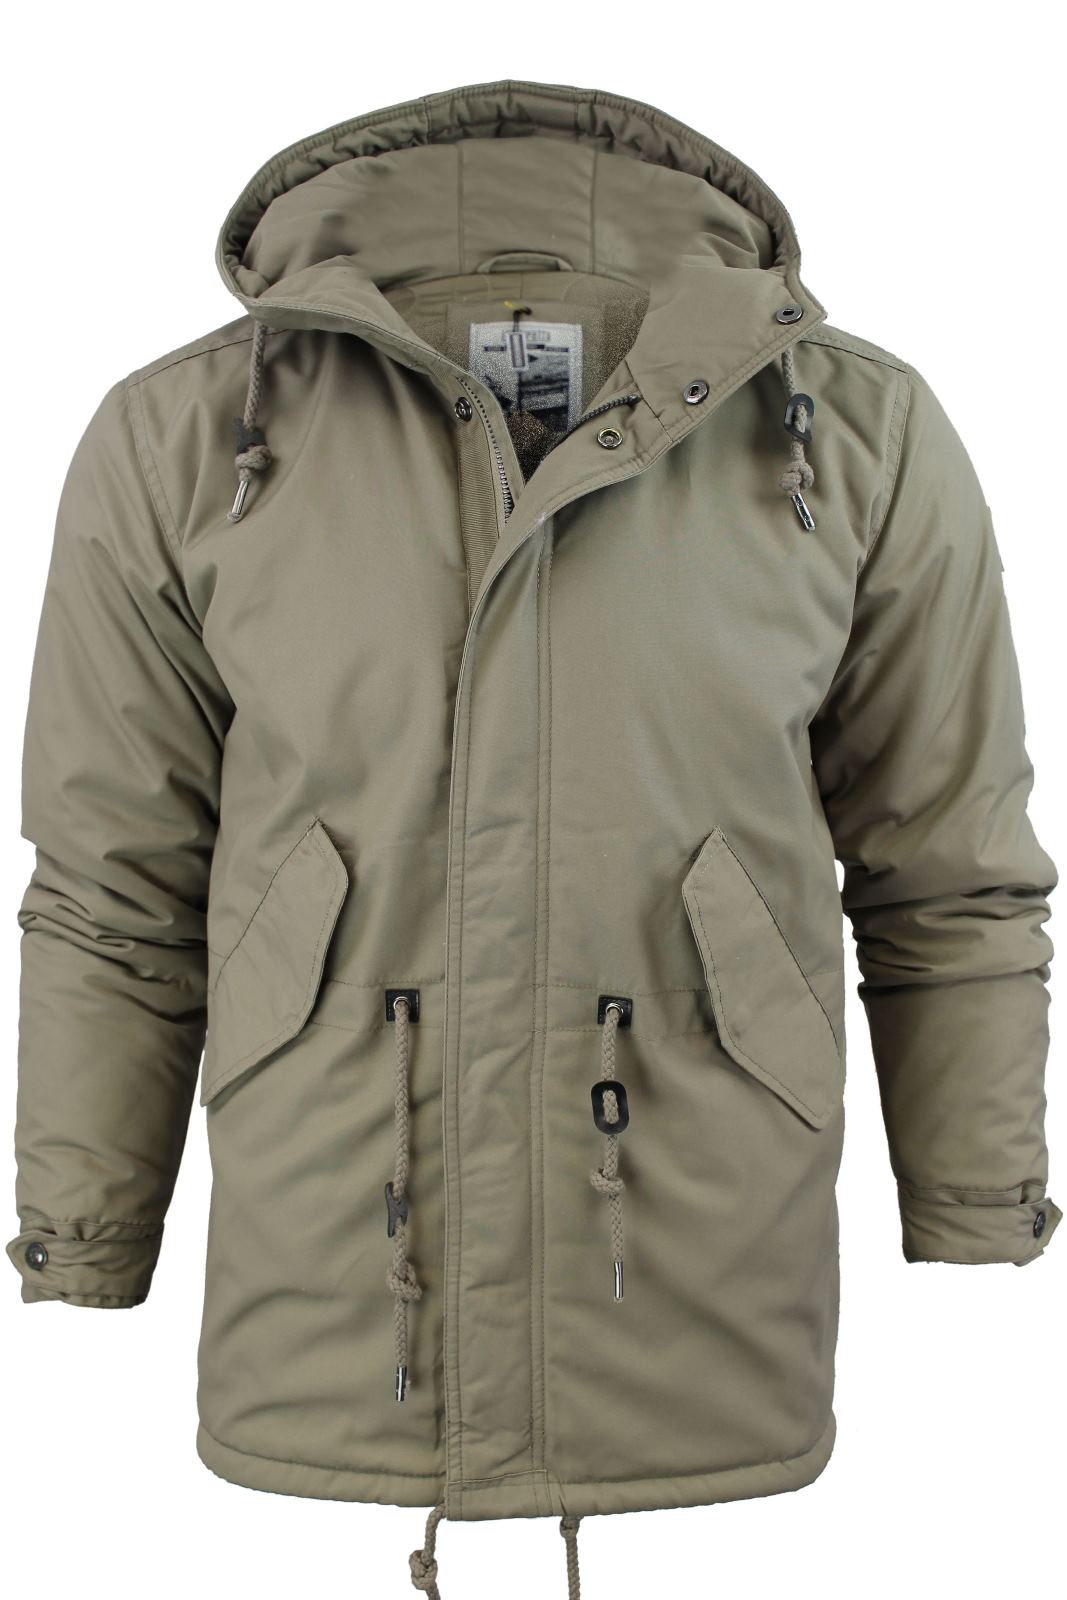 mens parka coats mens lambretta mod/ retro quilted fish tail parka jacket/ coat hooded arscfba